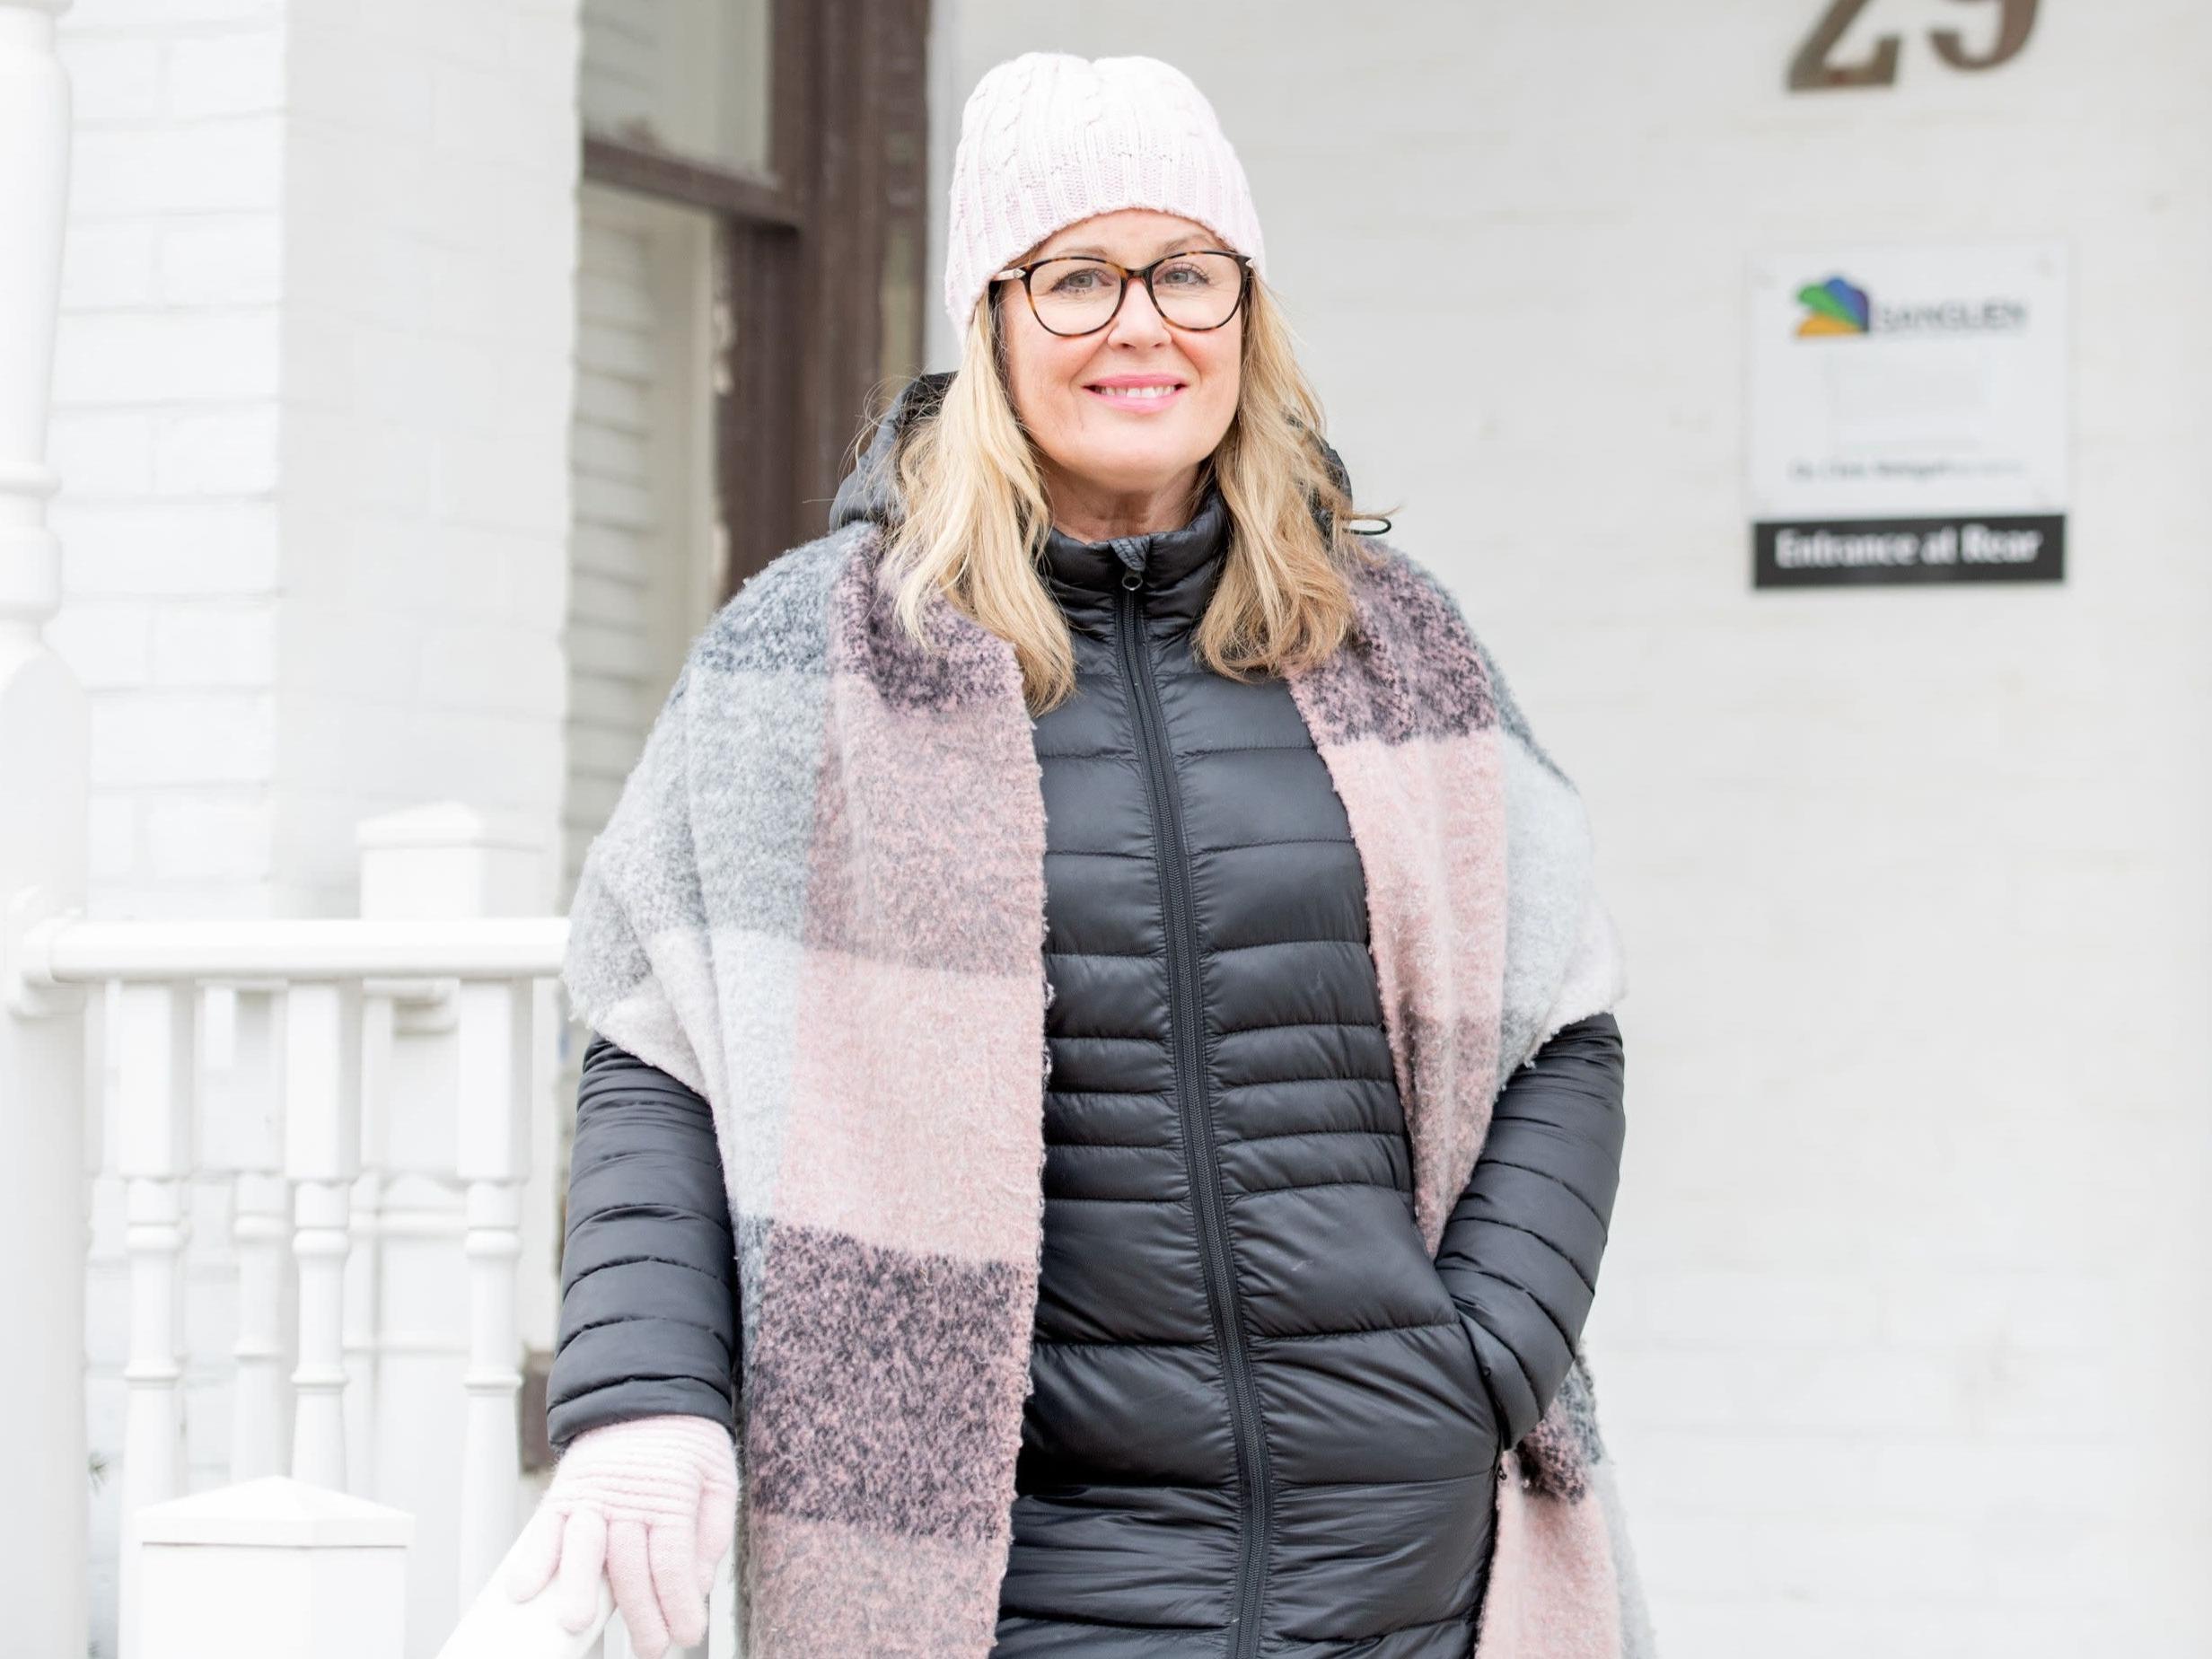 Heidi Morrison